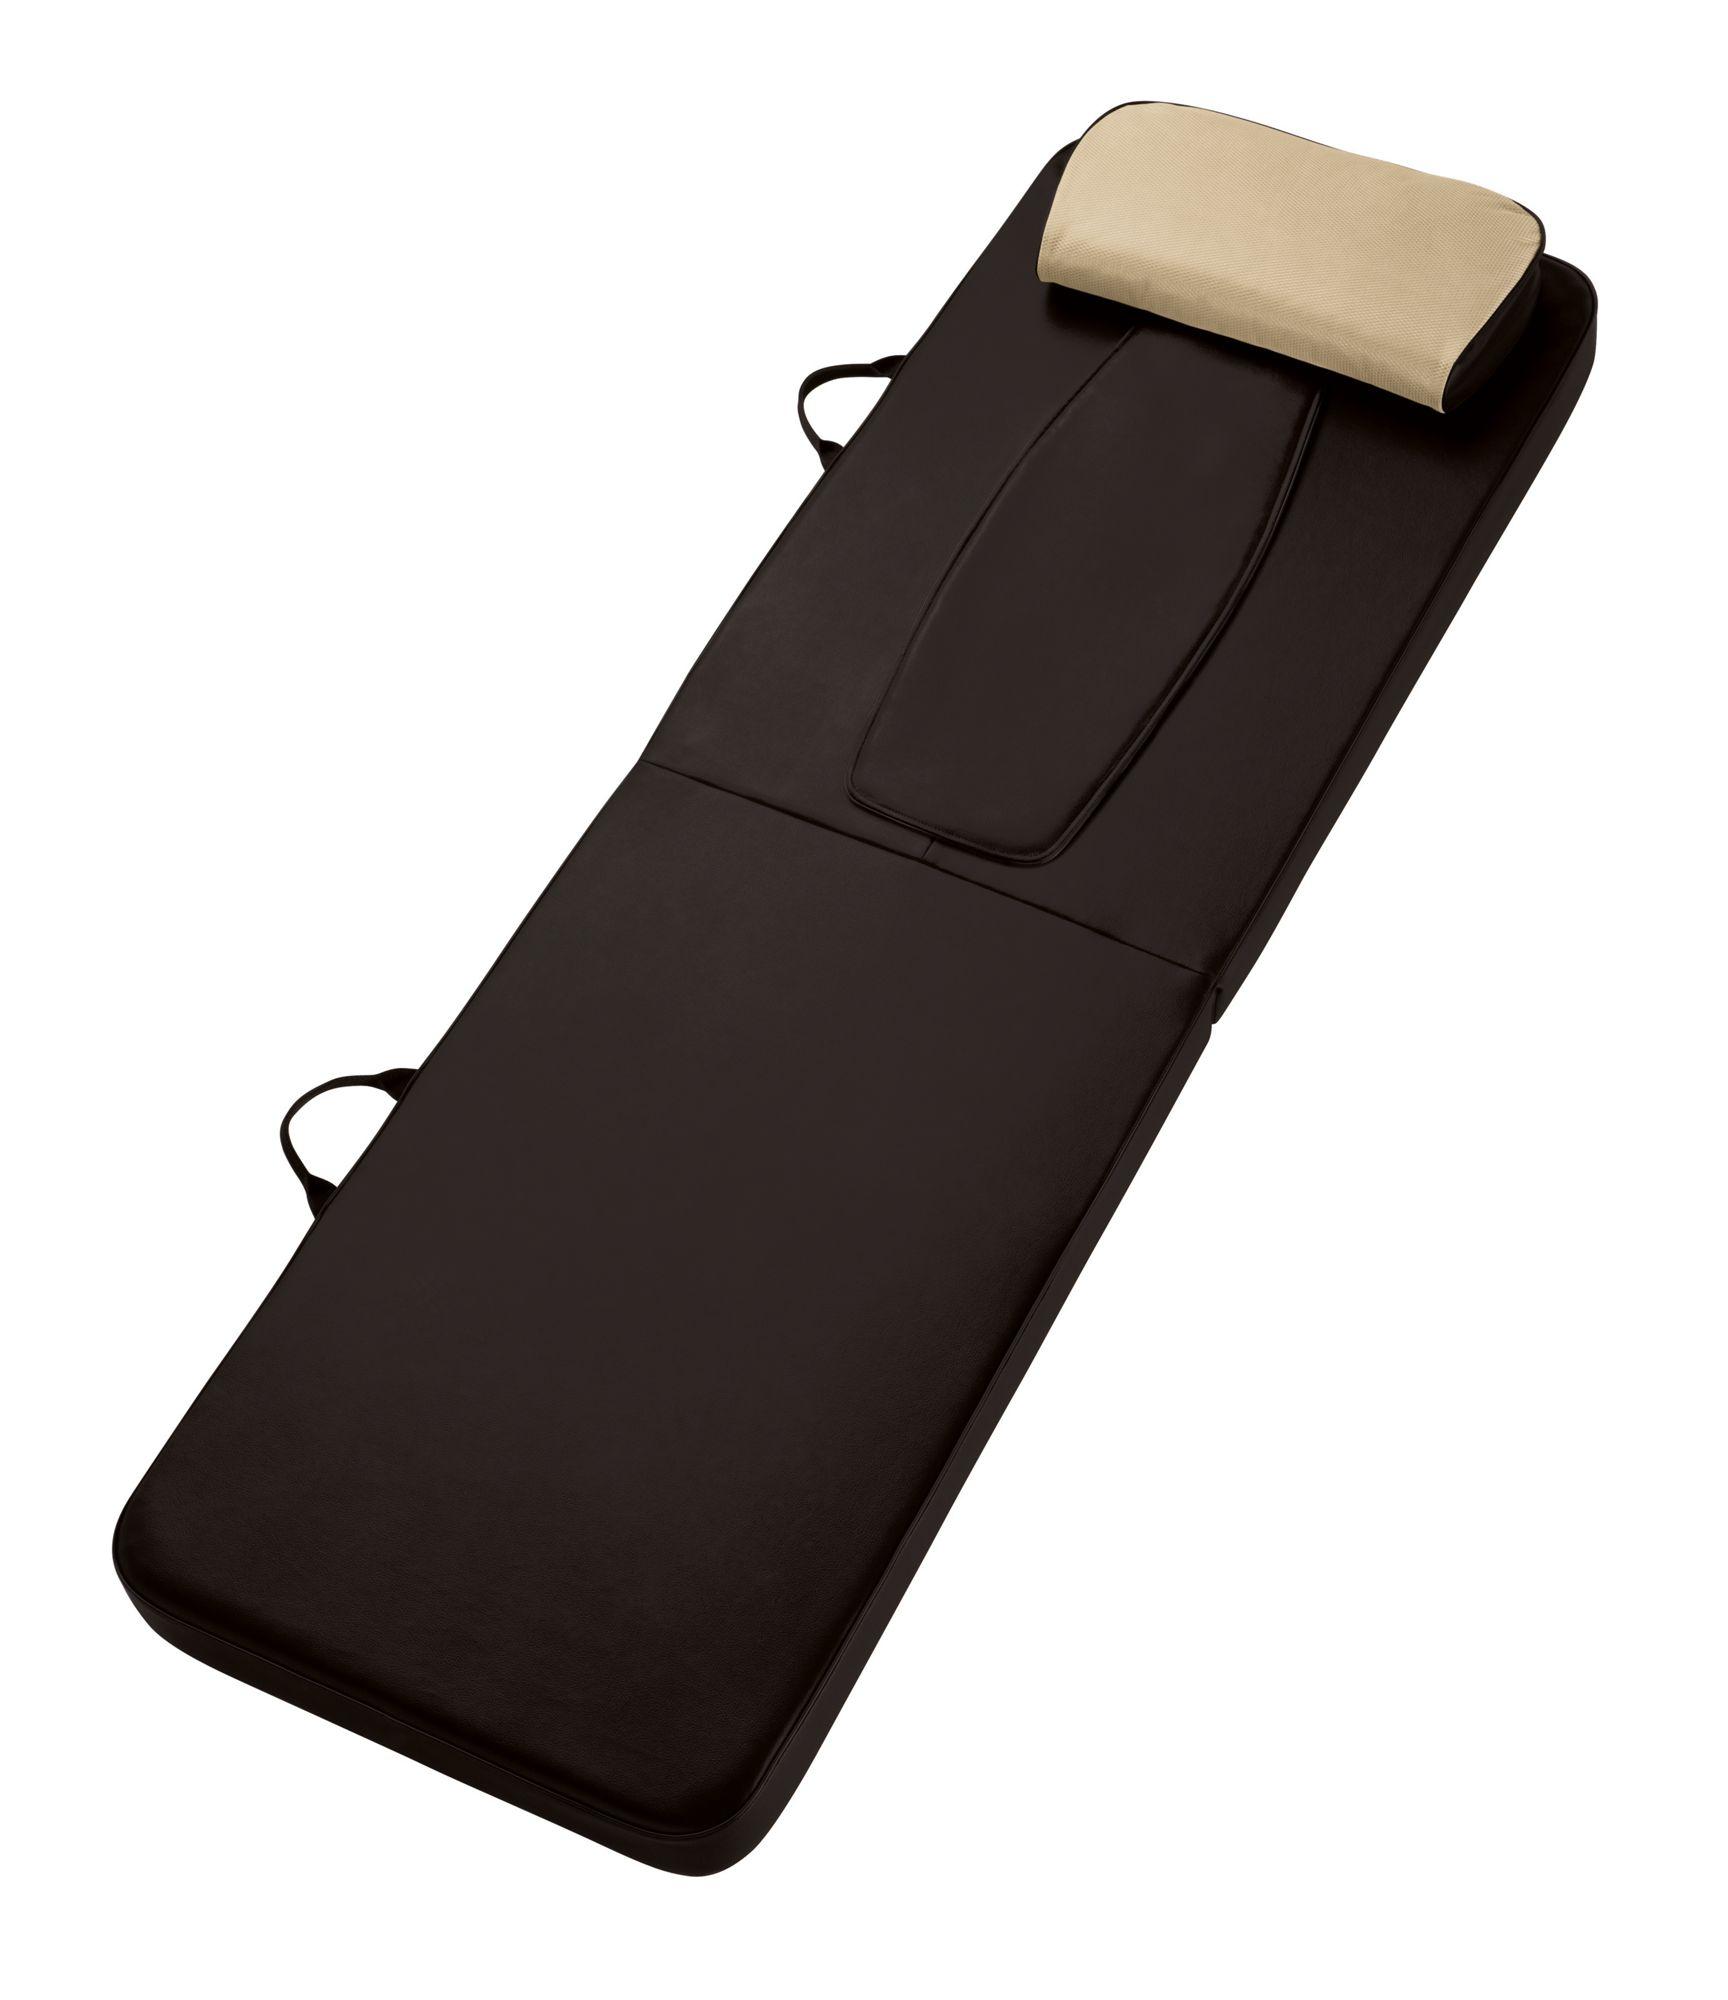 Homedics rmm 300h shiatsu back body massager mat new ebay for Full body shiatsu massage mat